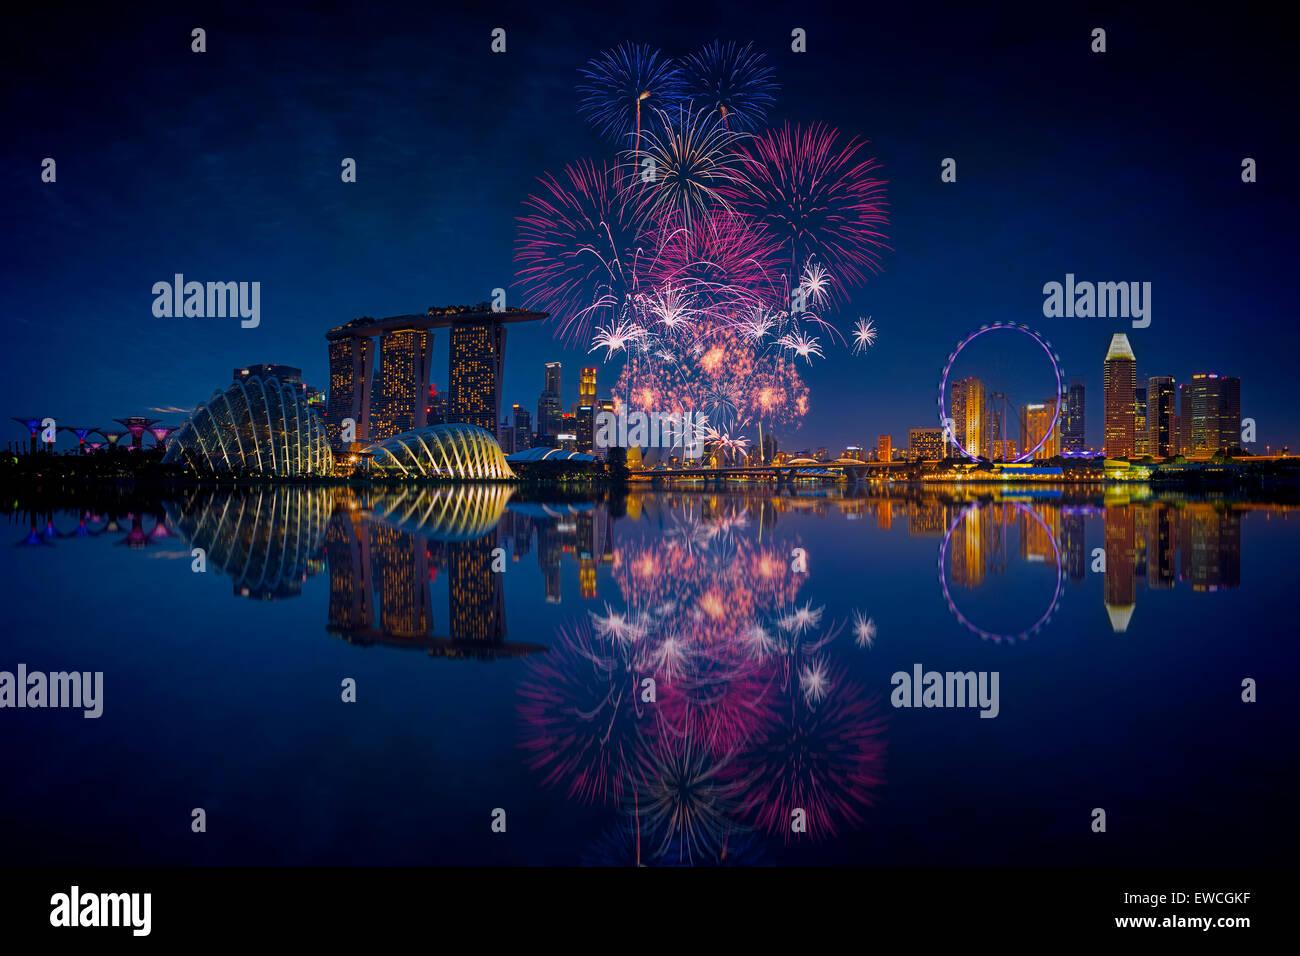 Singapur Fireworks Imagen De Stock